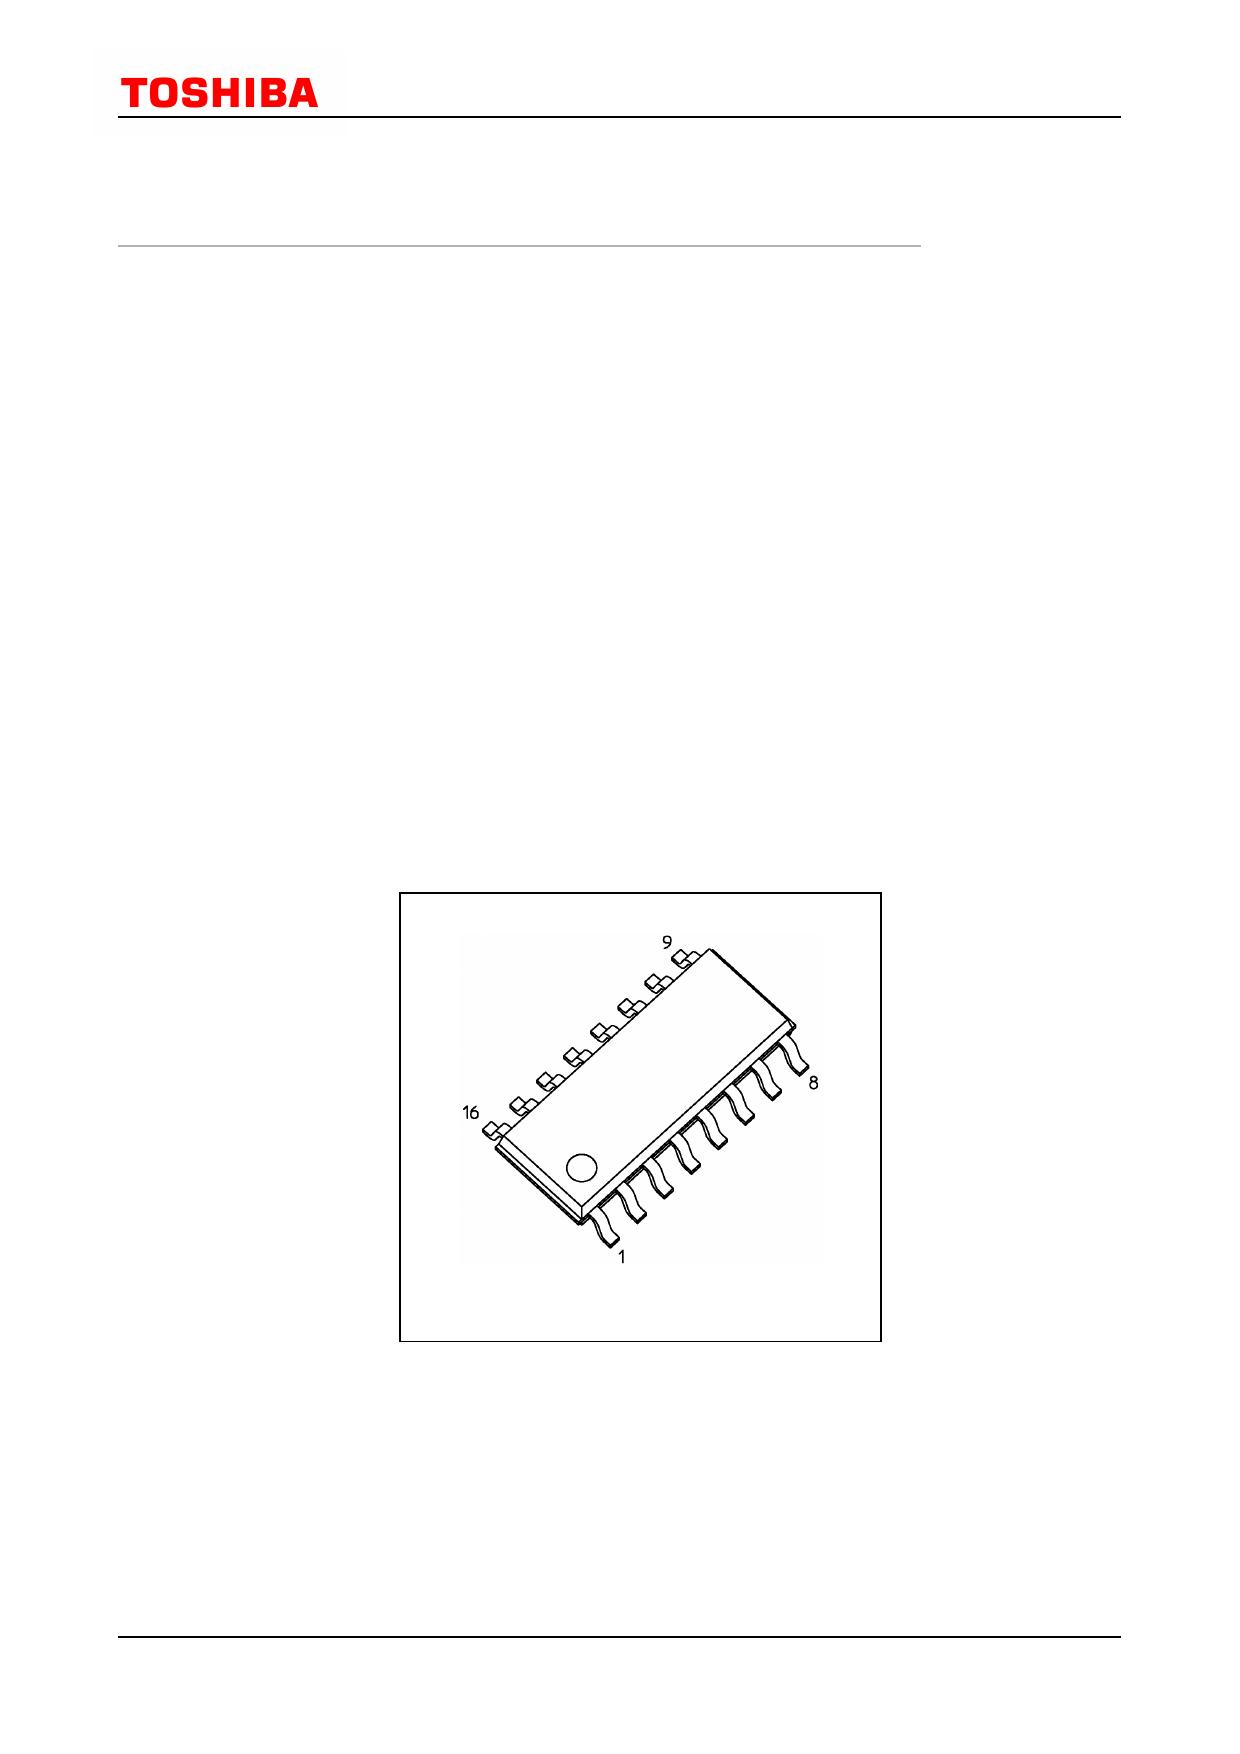 74HC151D Datasheet, 74HC151D PDF,ピン配置, 機能